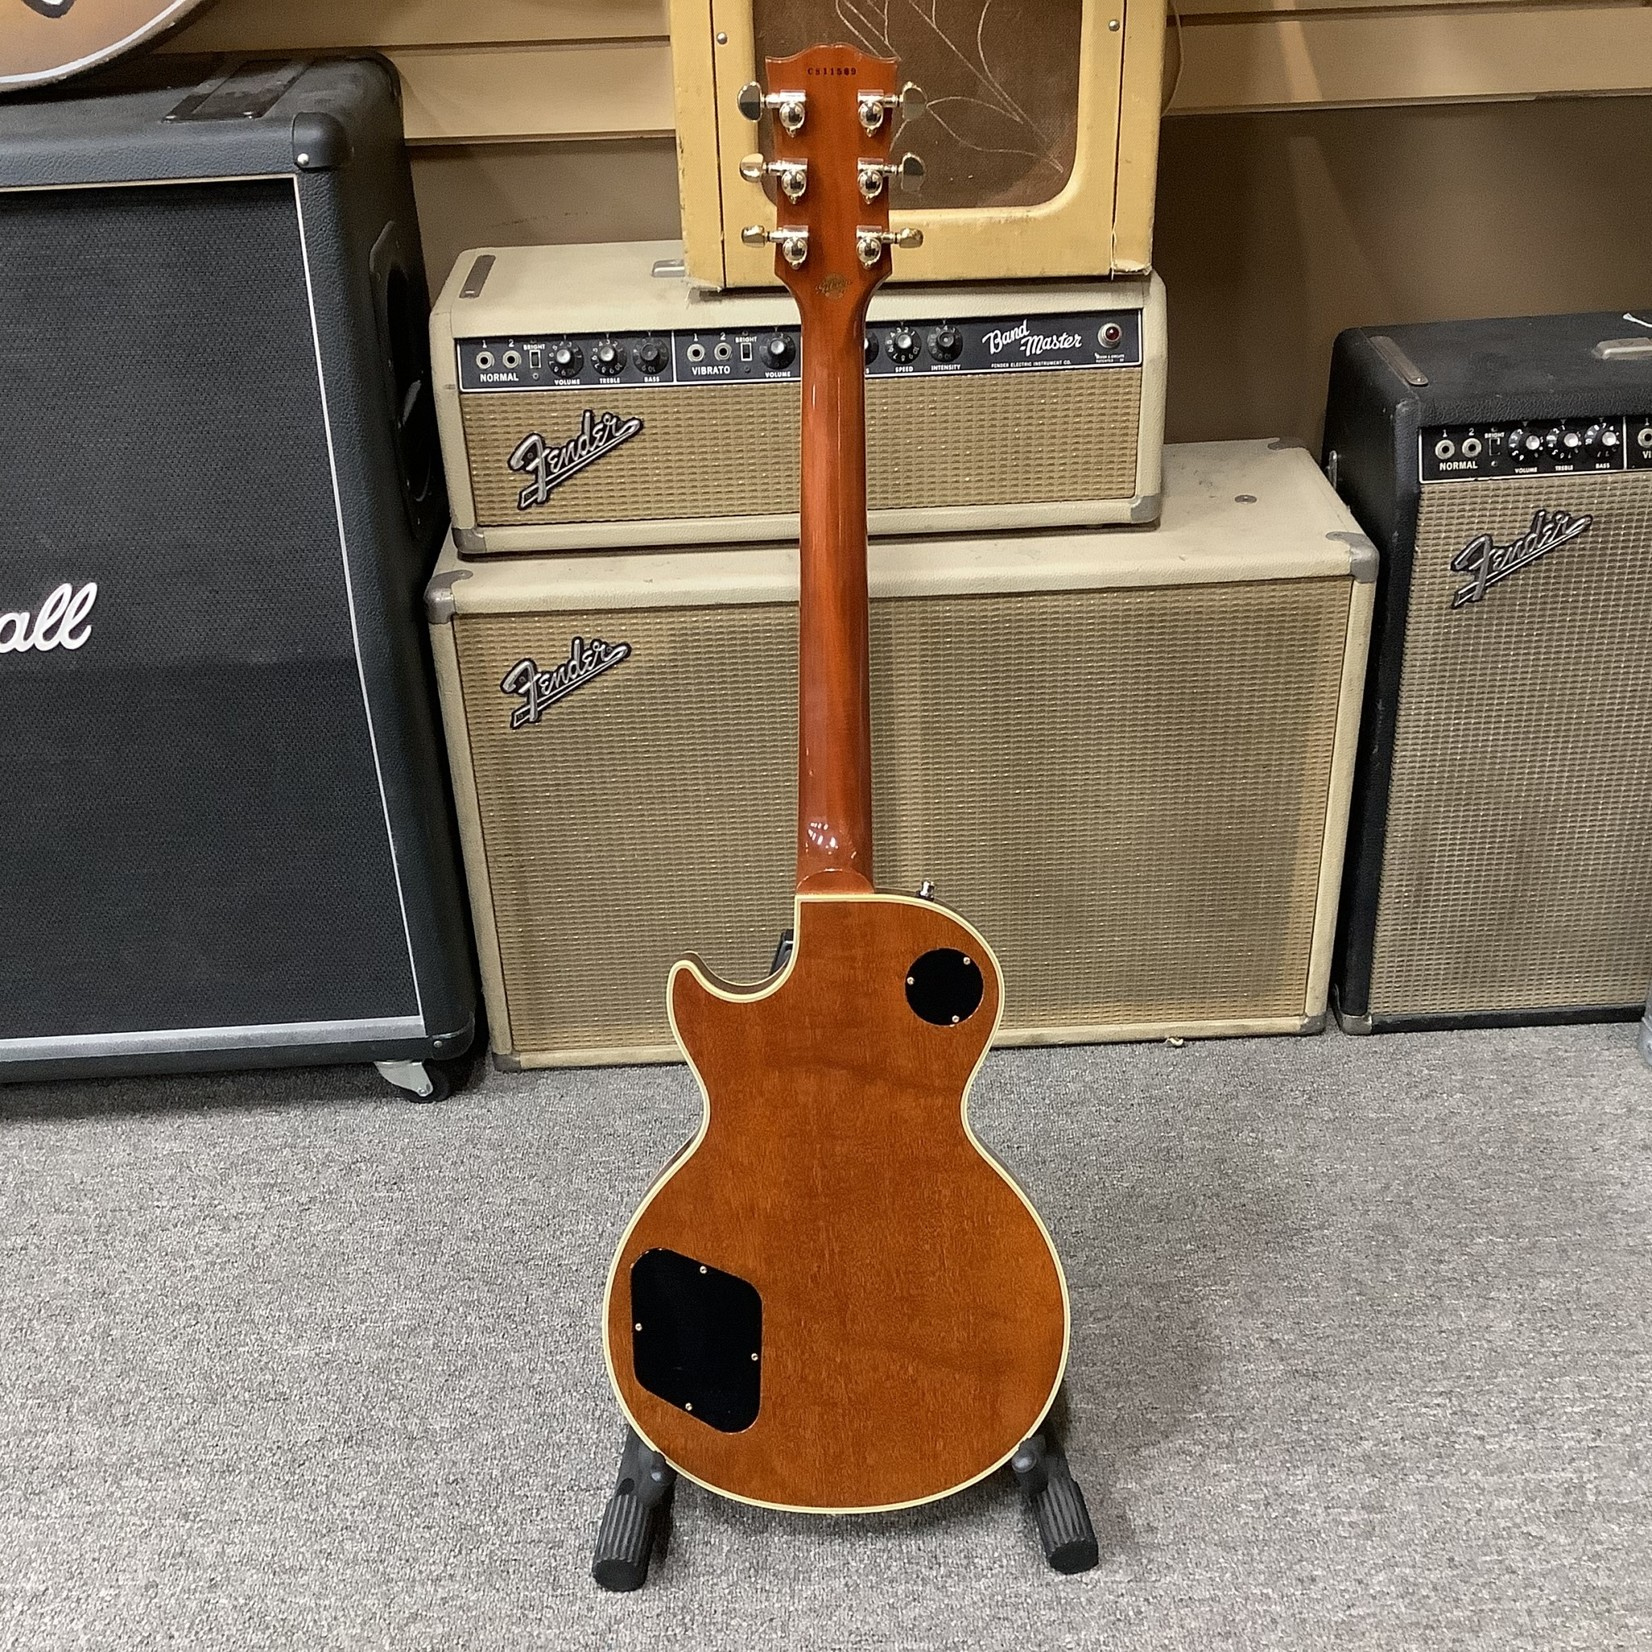 Gibson Late 90's Gibson Les Paul Custom Shop Florentine Limited Edition, F-Holes, Sunburst